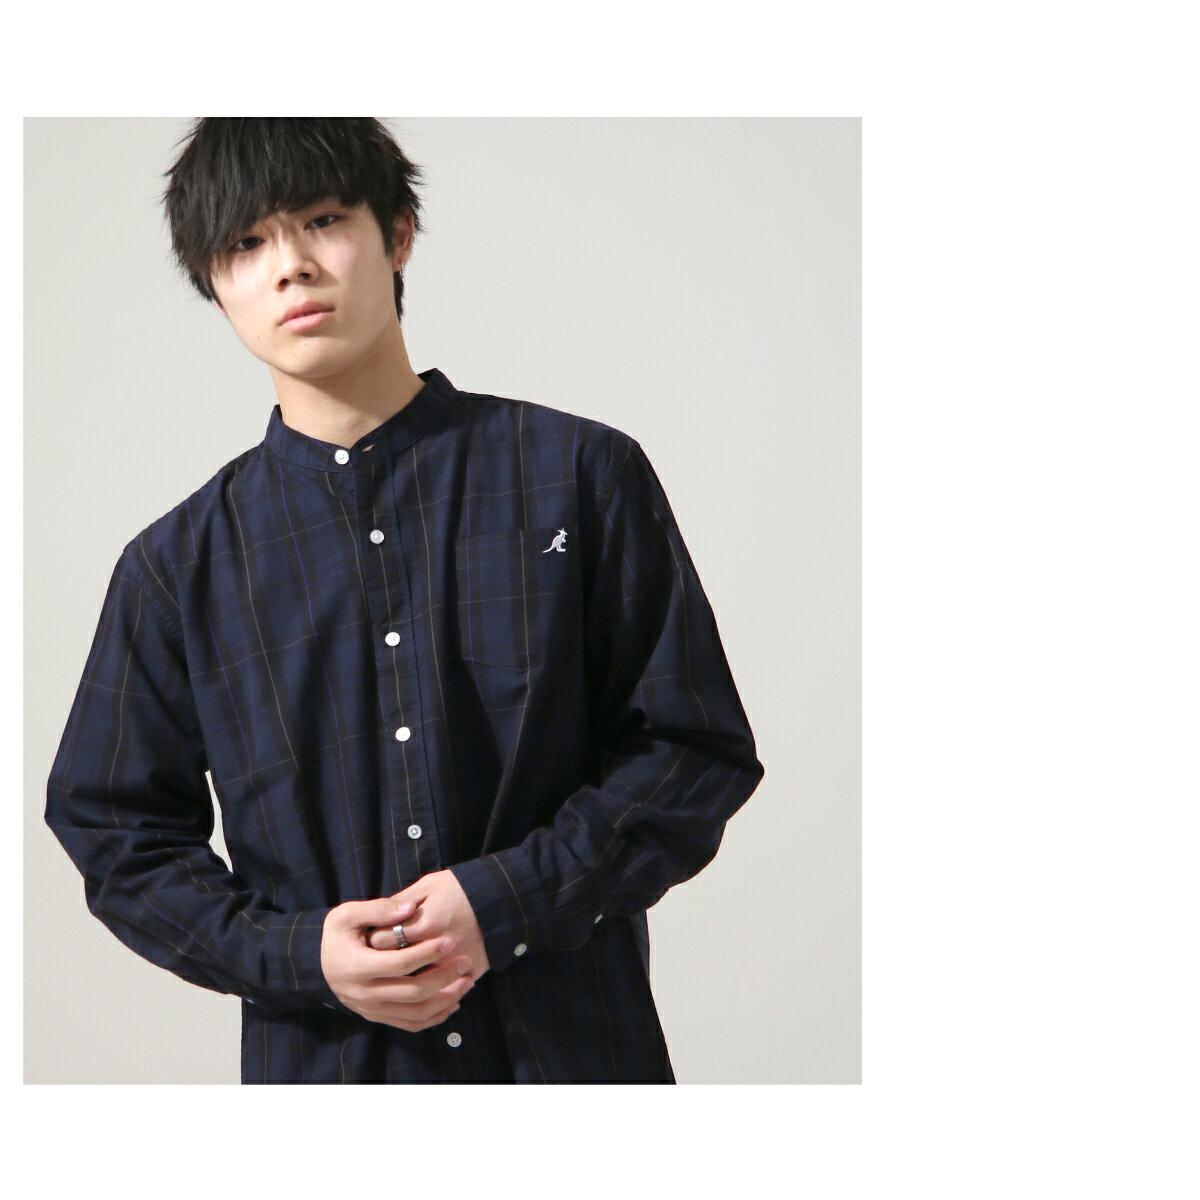 【New】KANGOL 立領襯衫 特注款 4